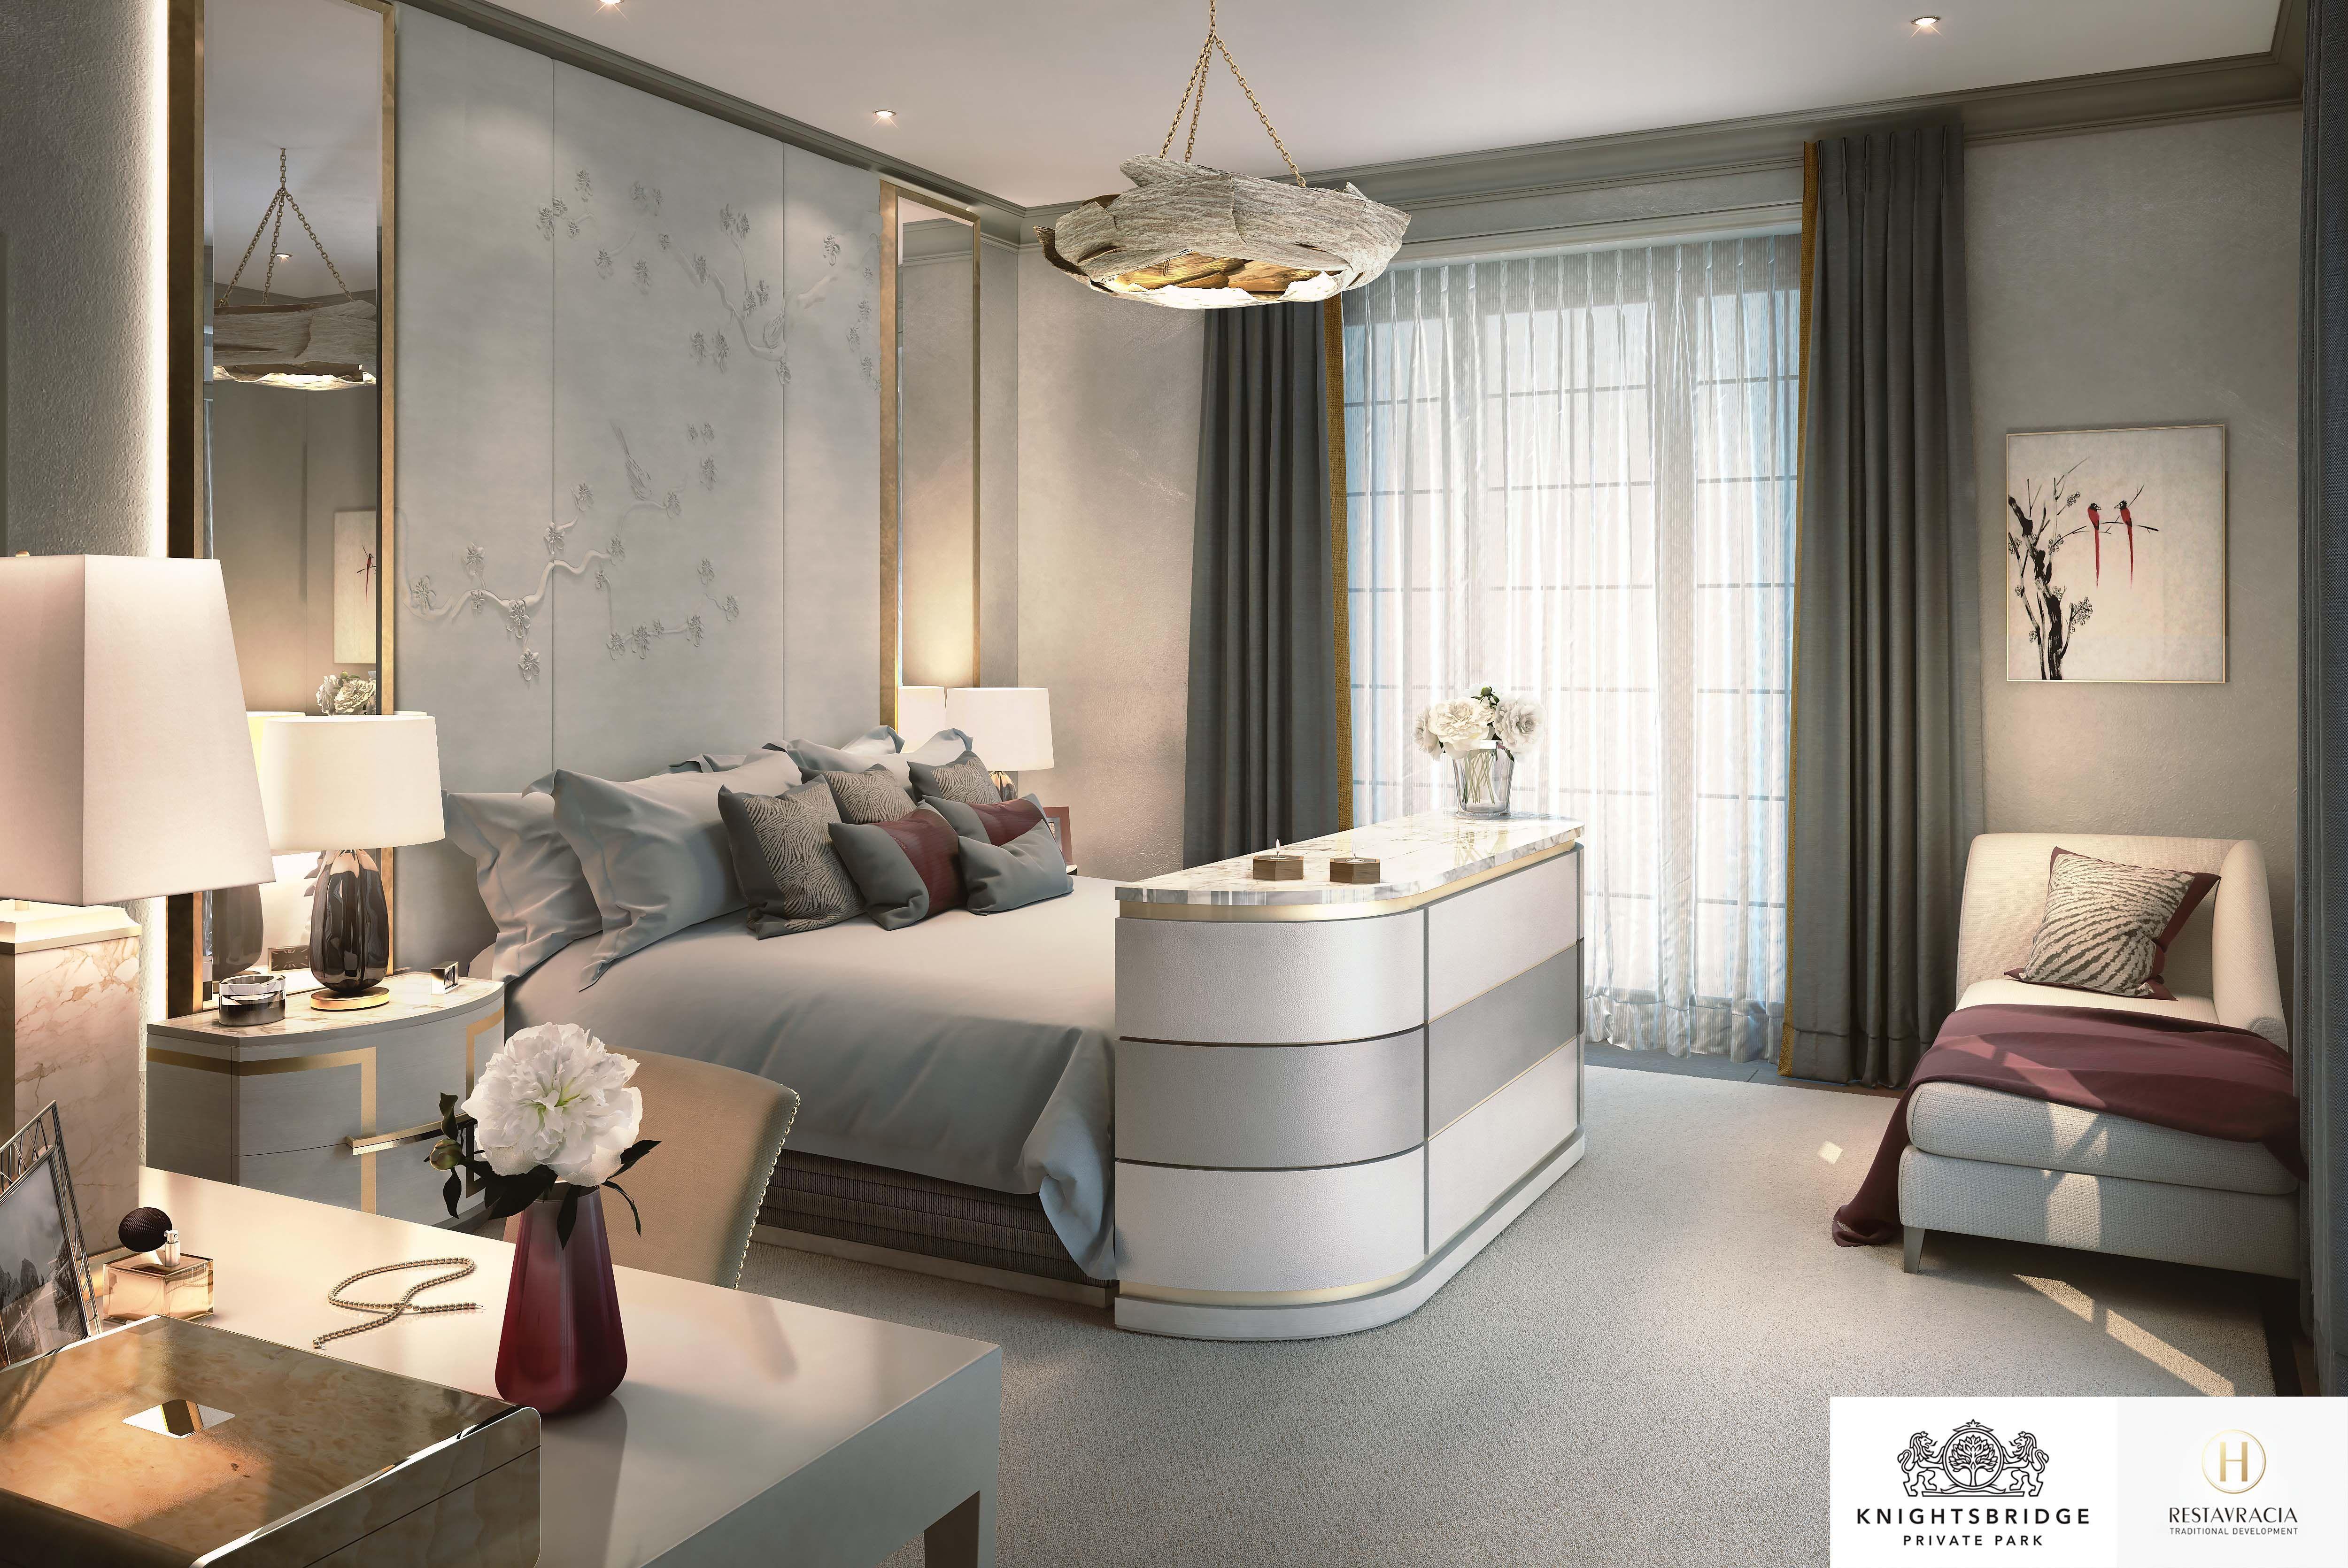 12 Genius Designs Of How To Build Bedroom Designs Modern Interior Design Ideas Photos Modern Luxury Bedroom Home Decor Bedroom Master Bedroom Interior